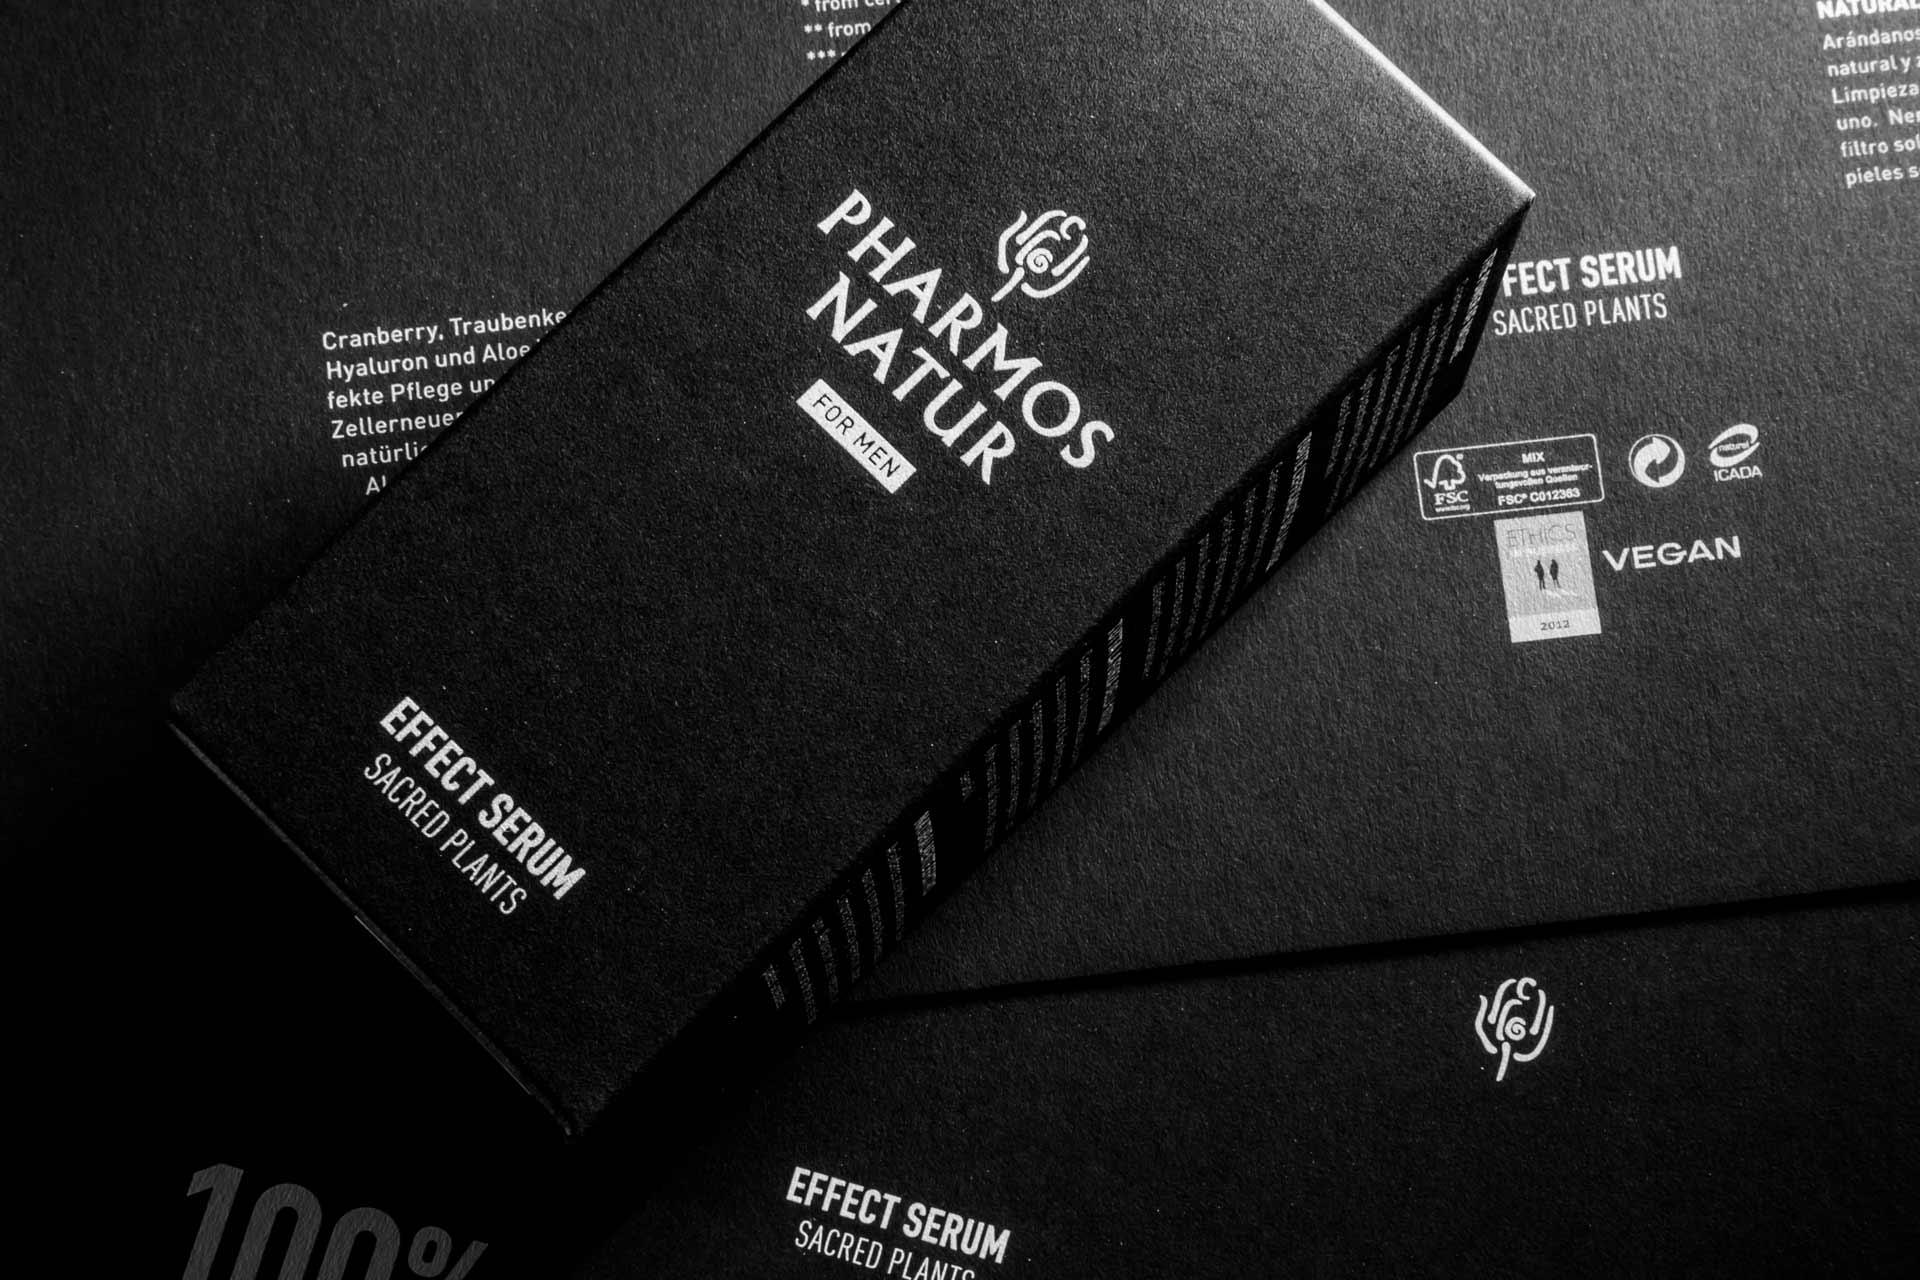 Pharmos Natur Männerlinie, Nature of Men, Fedrigoni, Sirio Ultra Black, Packagingdesign, Bernhard Hafele